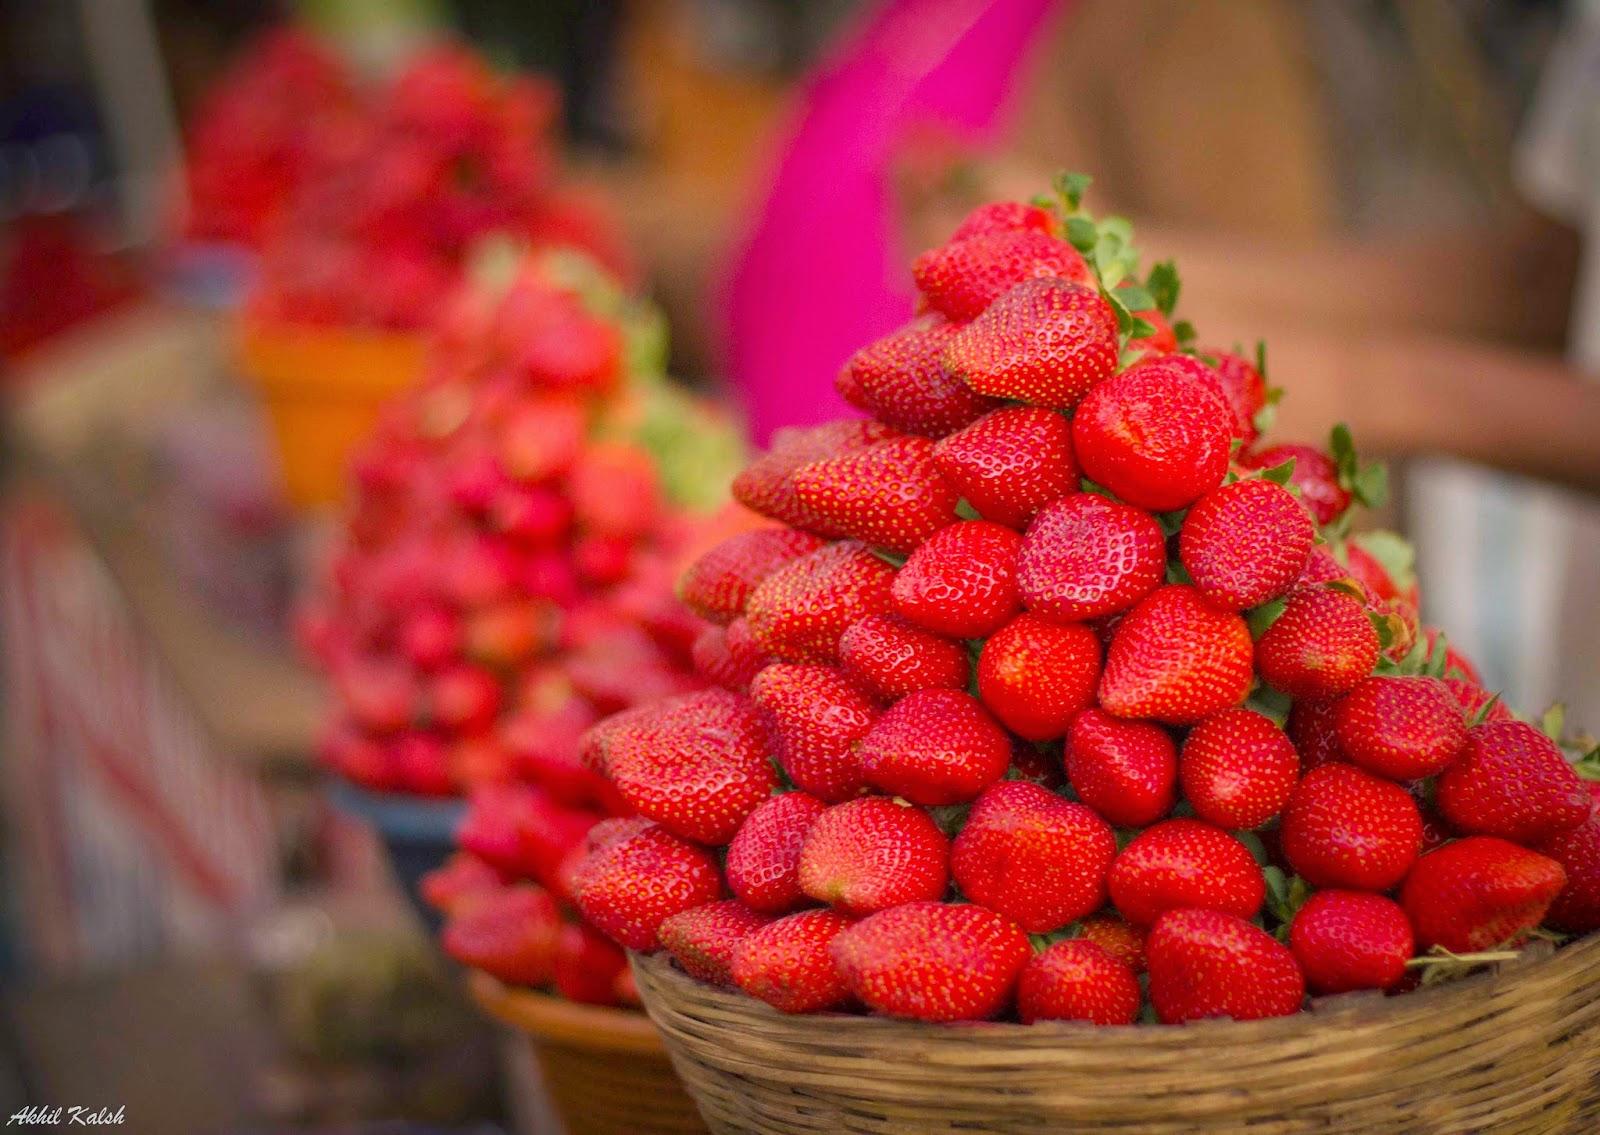 La Trinidad Strawberry Festival 2015 Schedule And Calendar Of Events